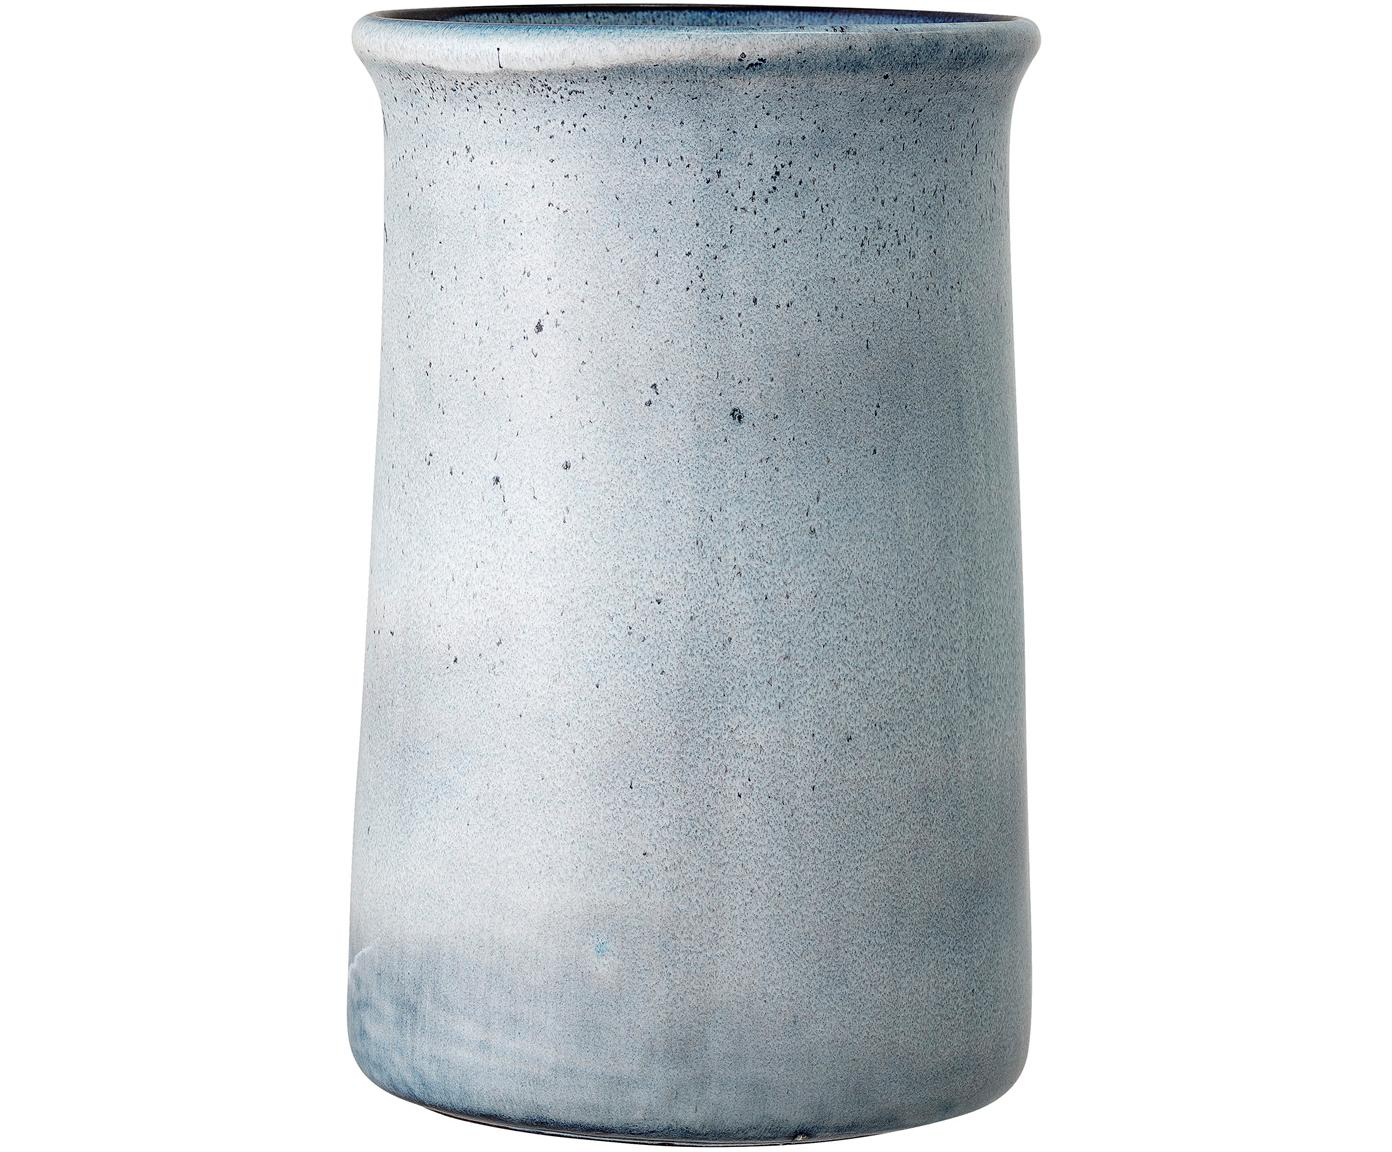 Flessenkoeler Sandrine, Keramiek, Blauw, Ø 15 cm